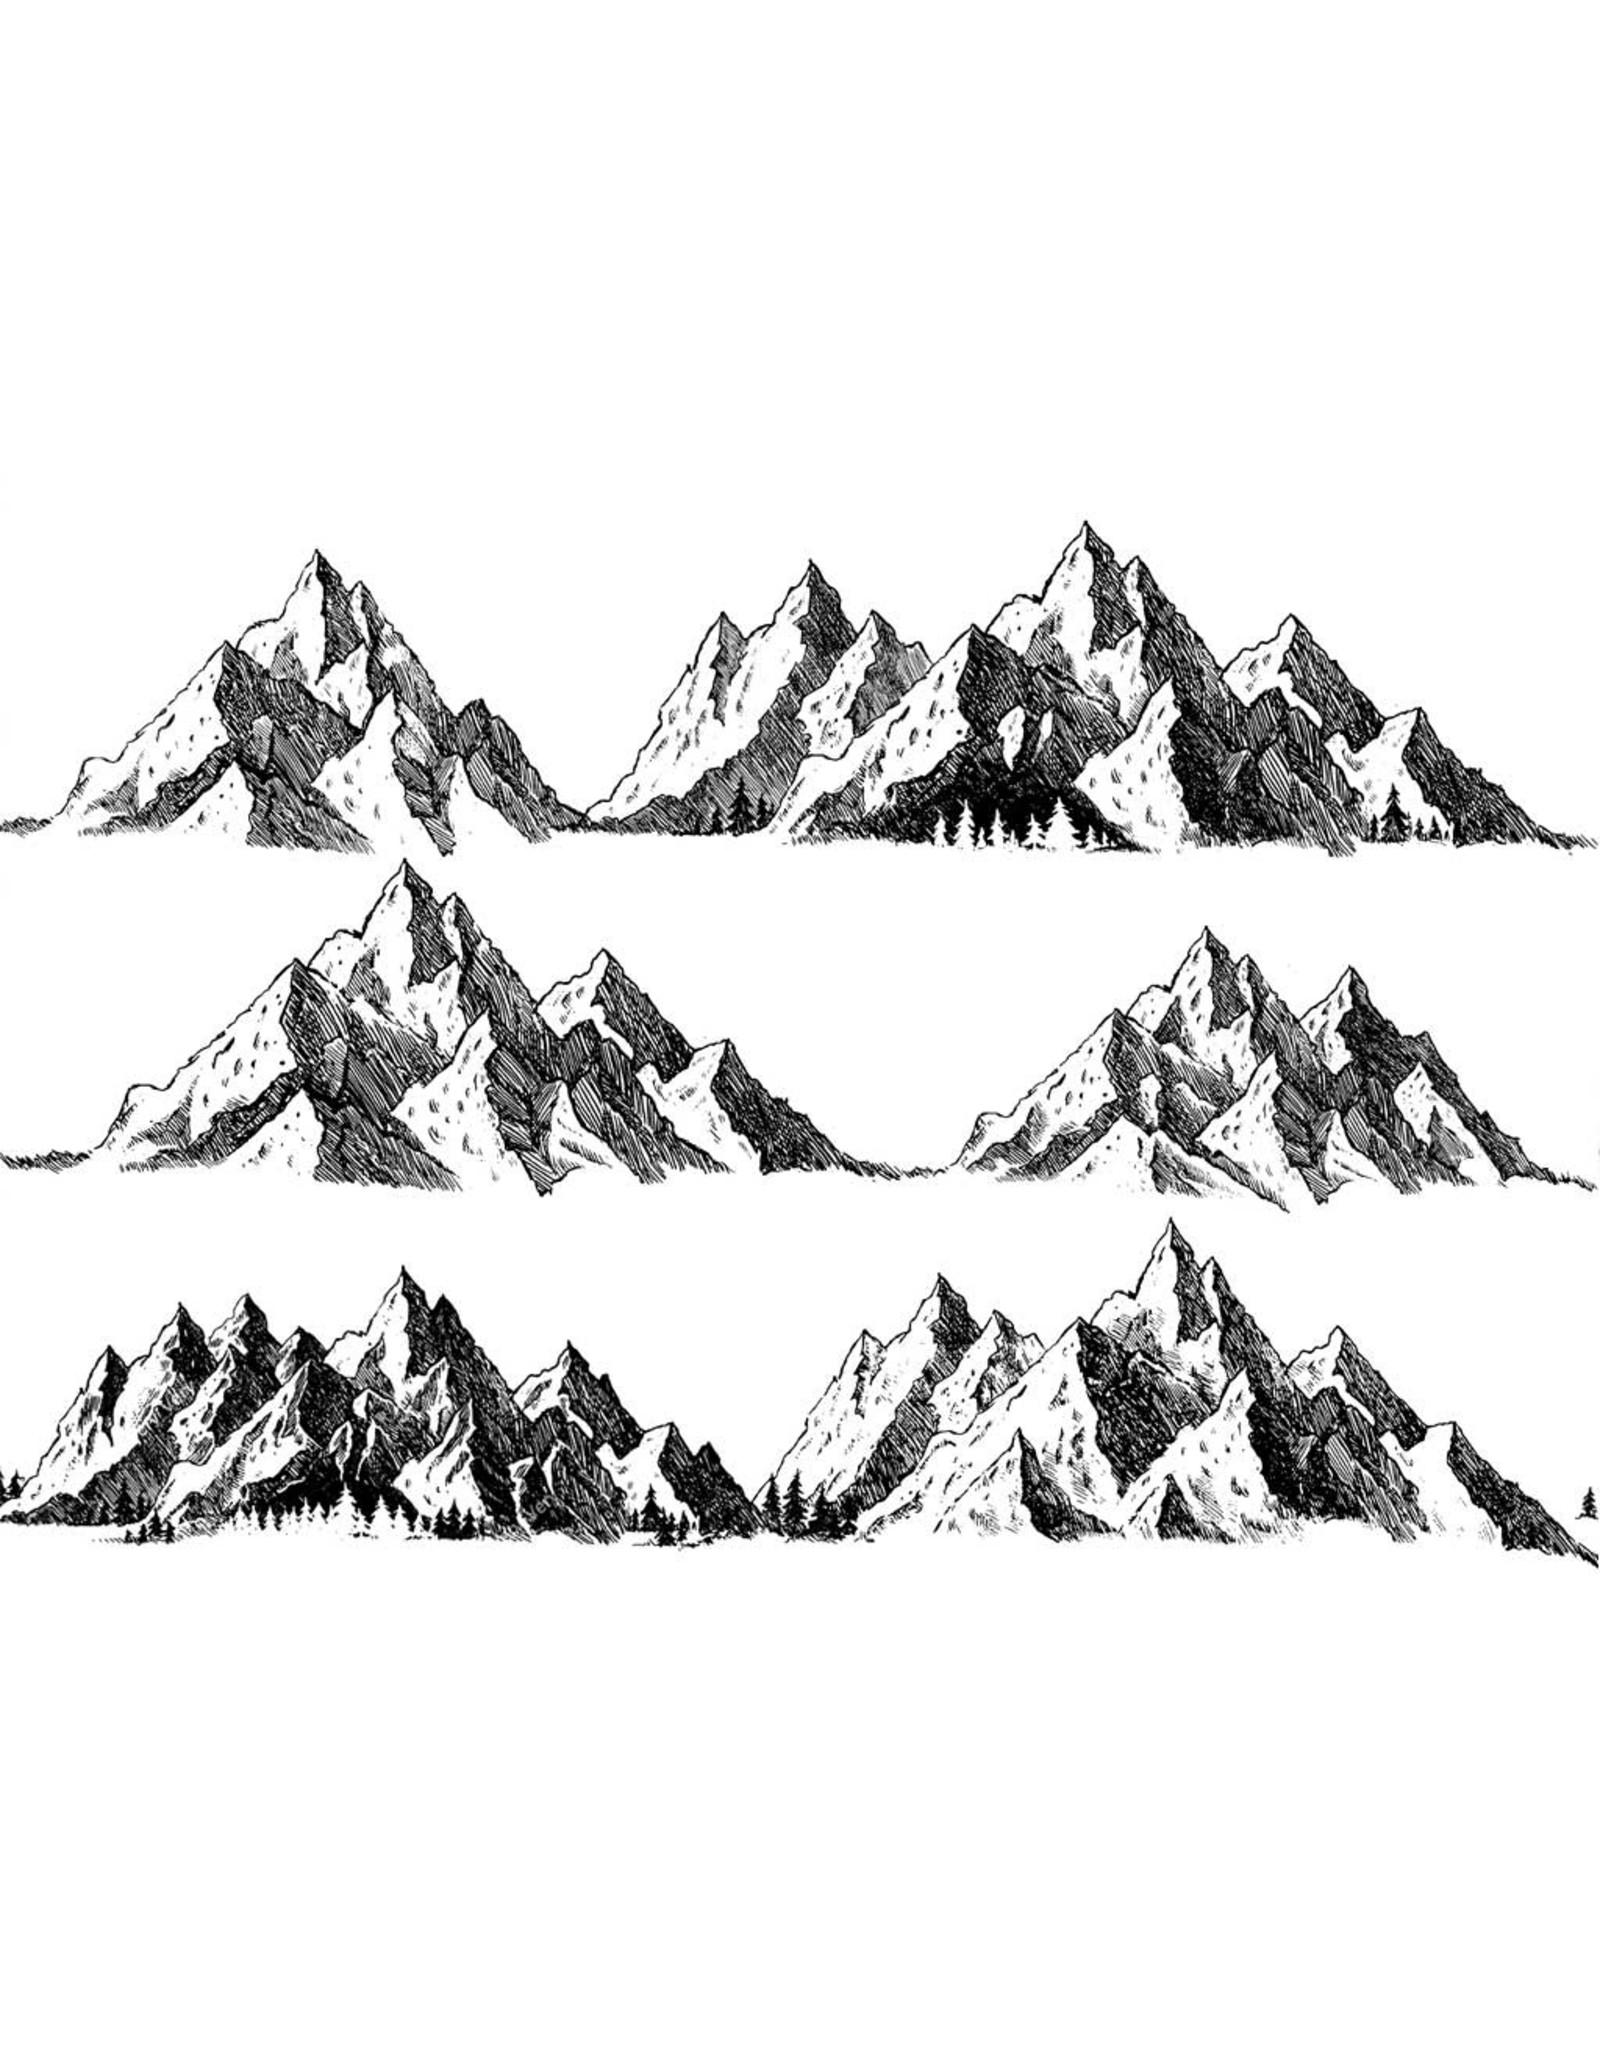 Sanbao Mountain